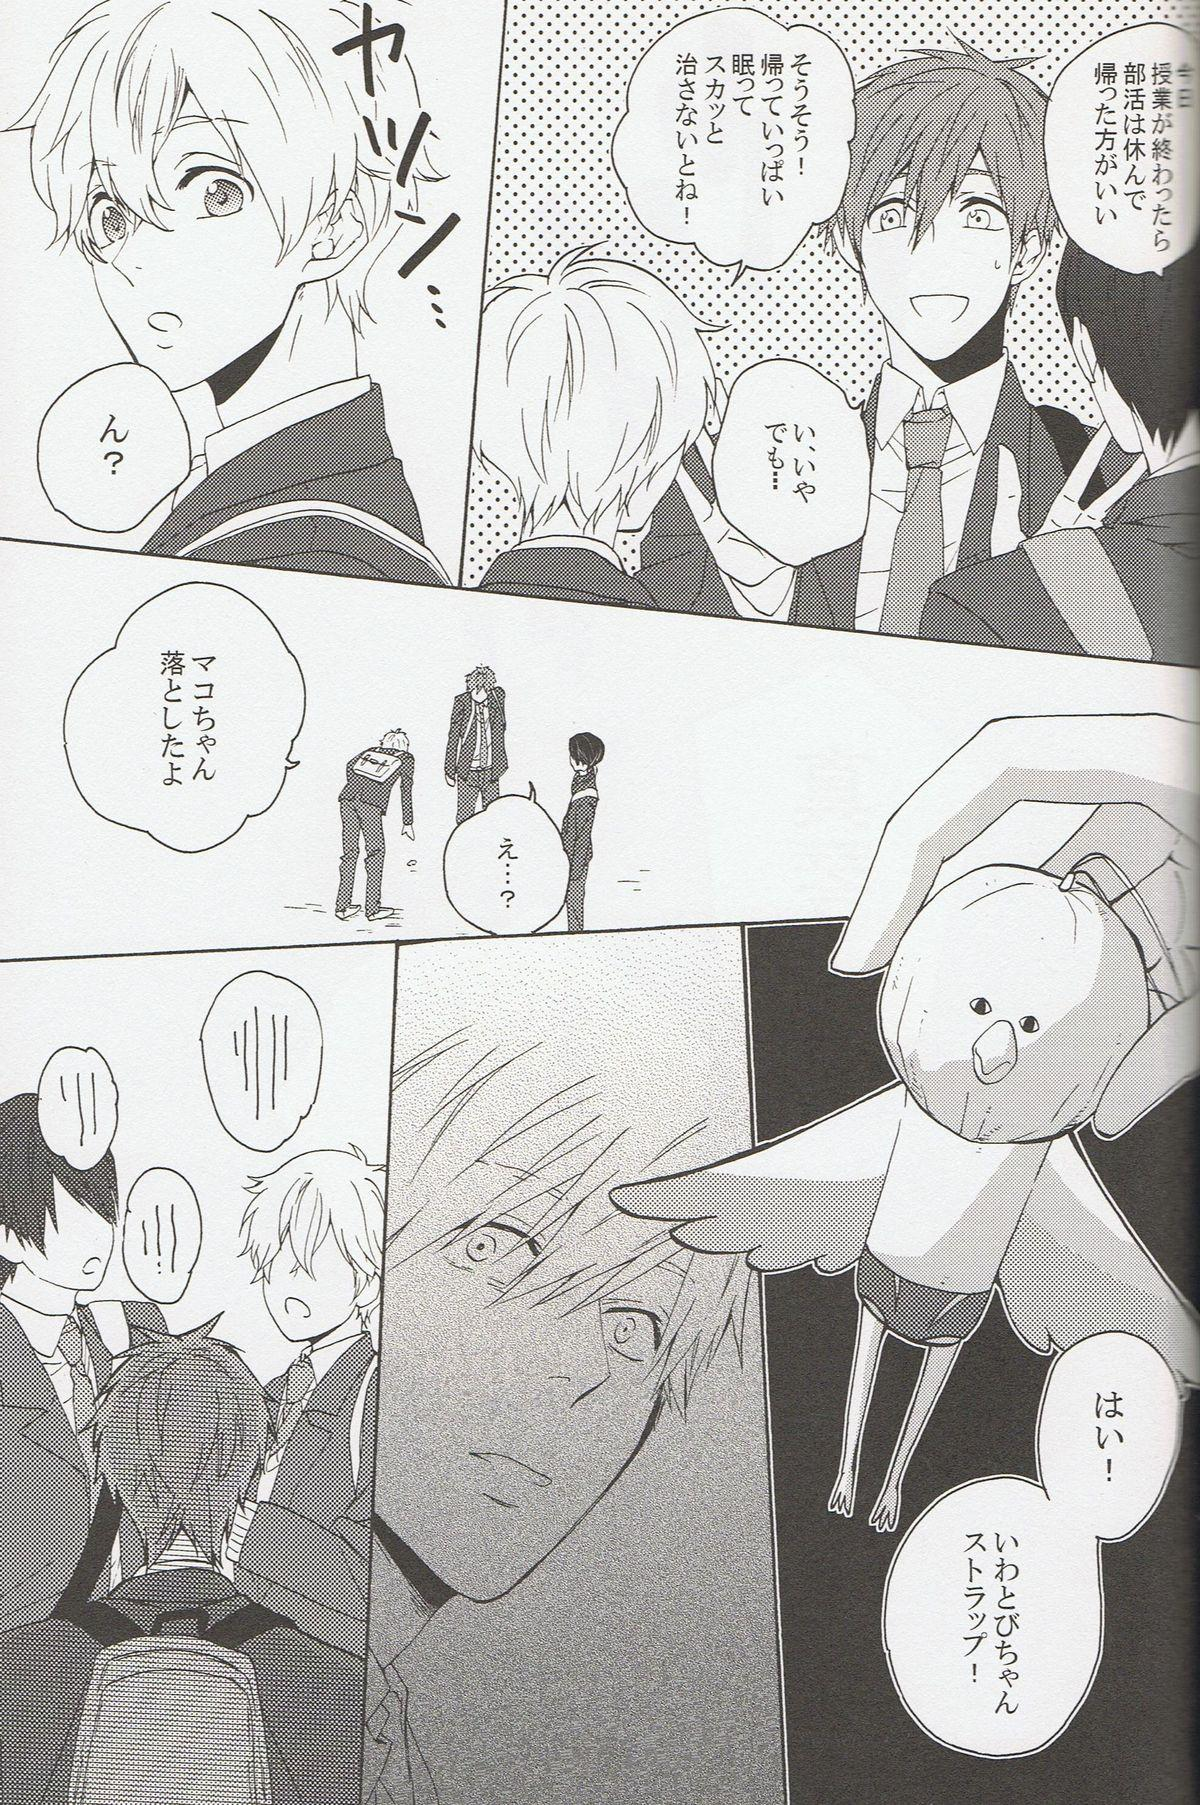 Furikaereba Iwatobi-chan 15